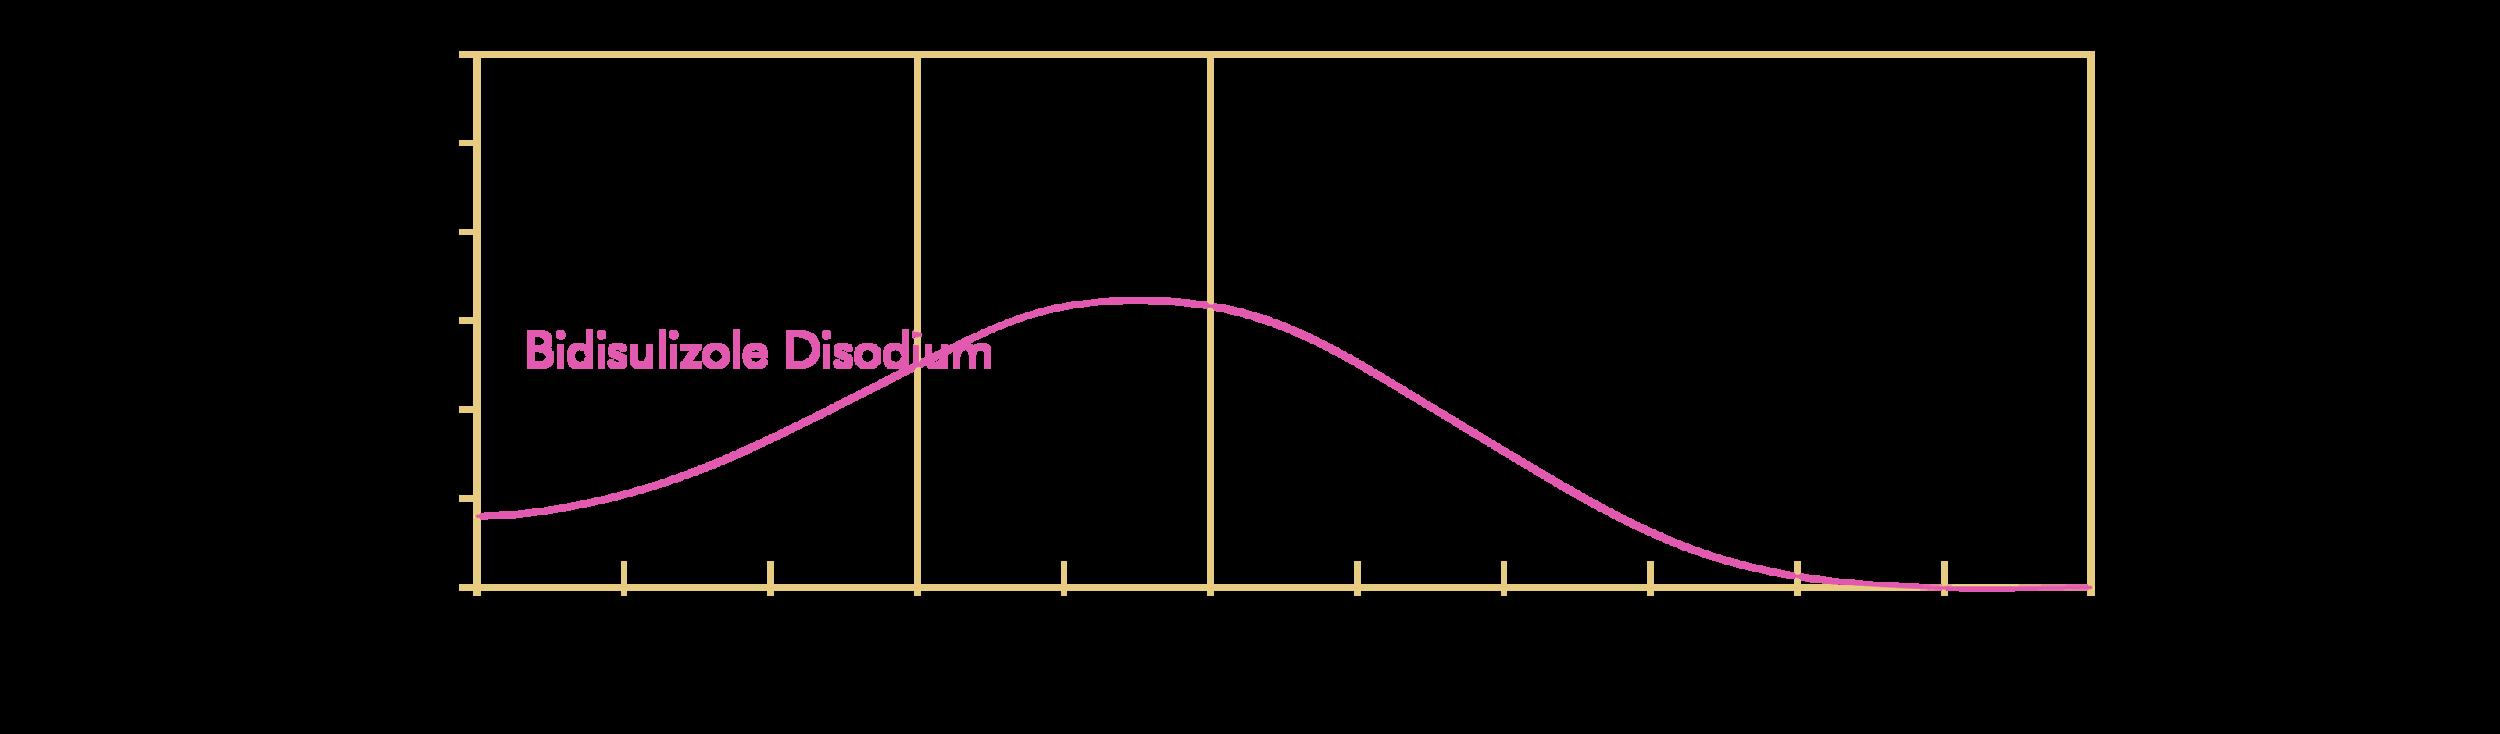 Bidisulizole Disodium; Neo Heliopan AP (Symrise); INCI: Disodium Phenyl Dibenzimidazole Tetrasulfonate